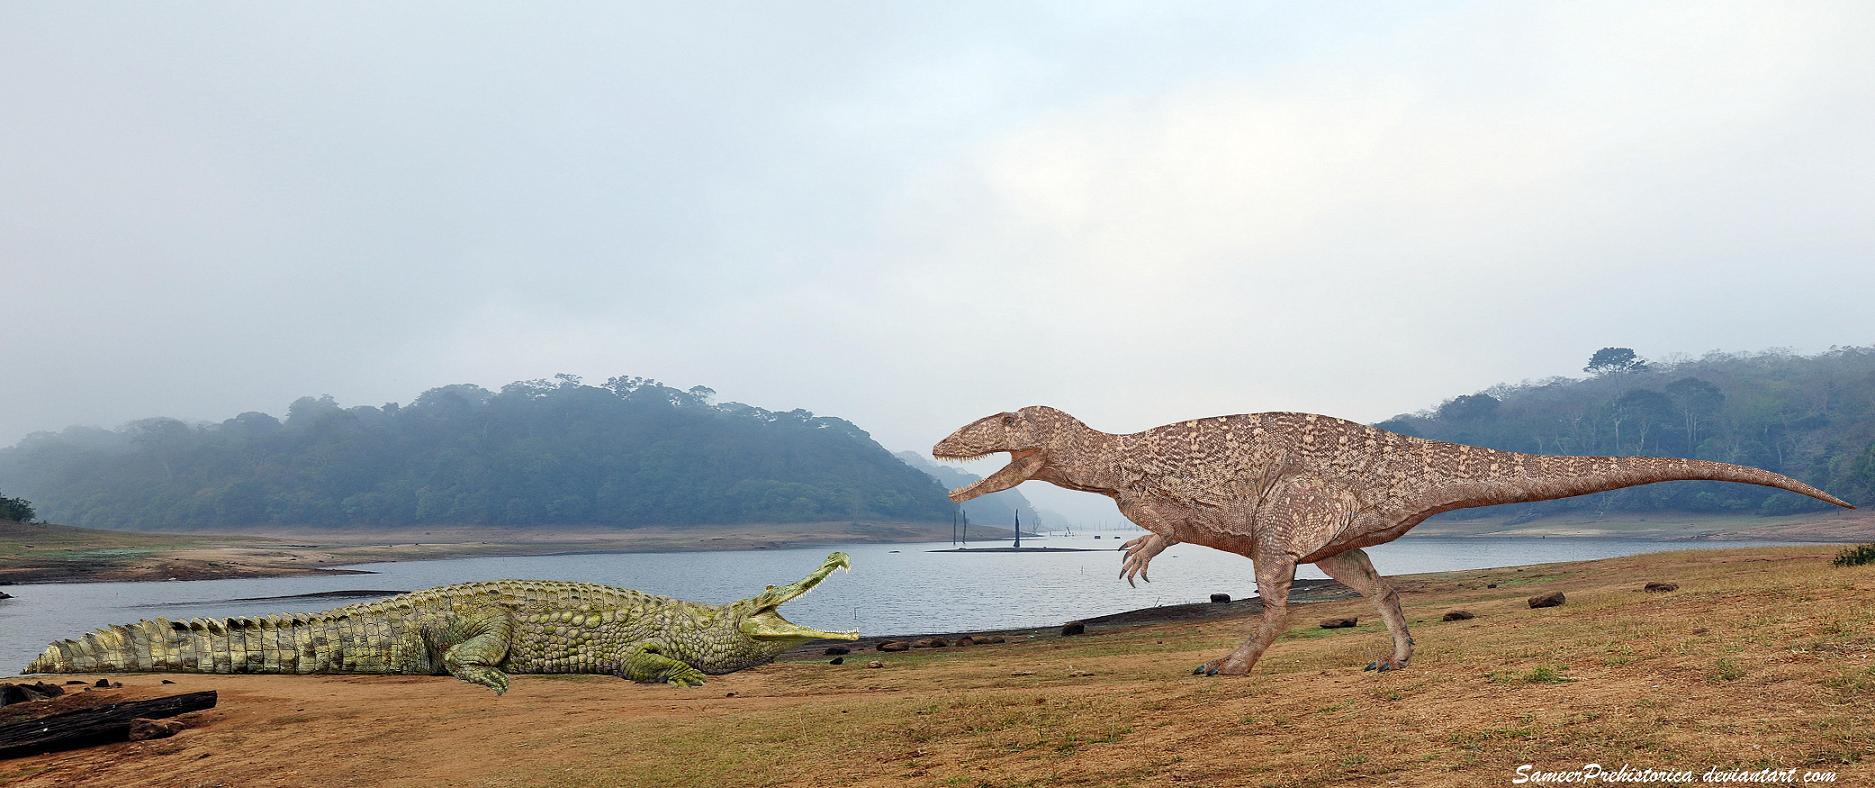 Sarcosuchus vs Carcharodontosaurus by SameerPrehistorica ...